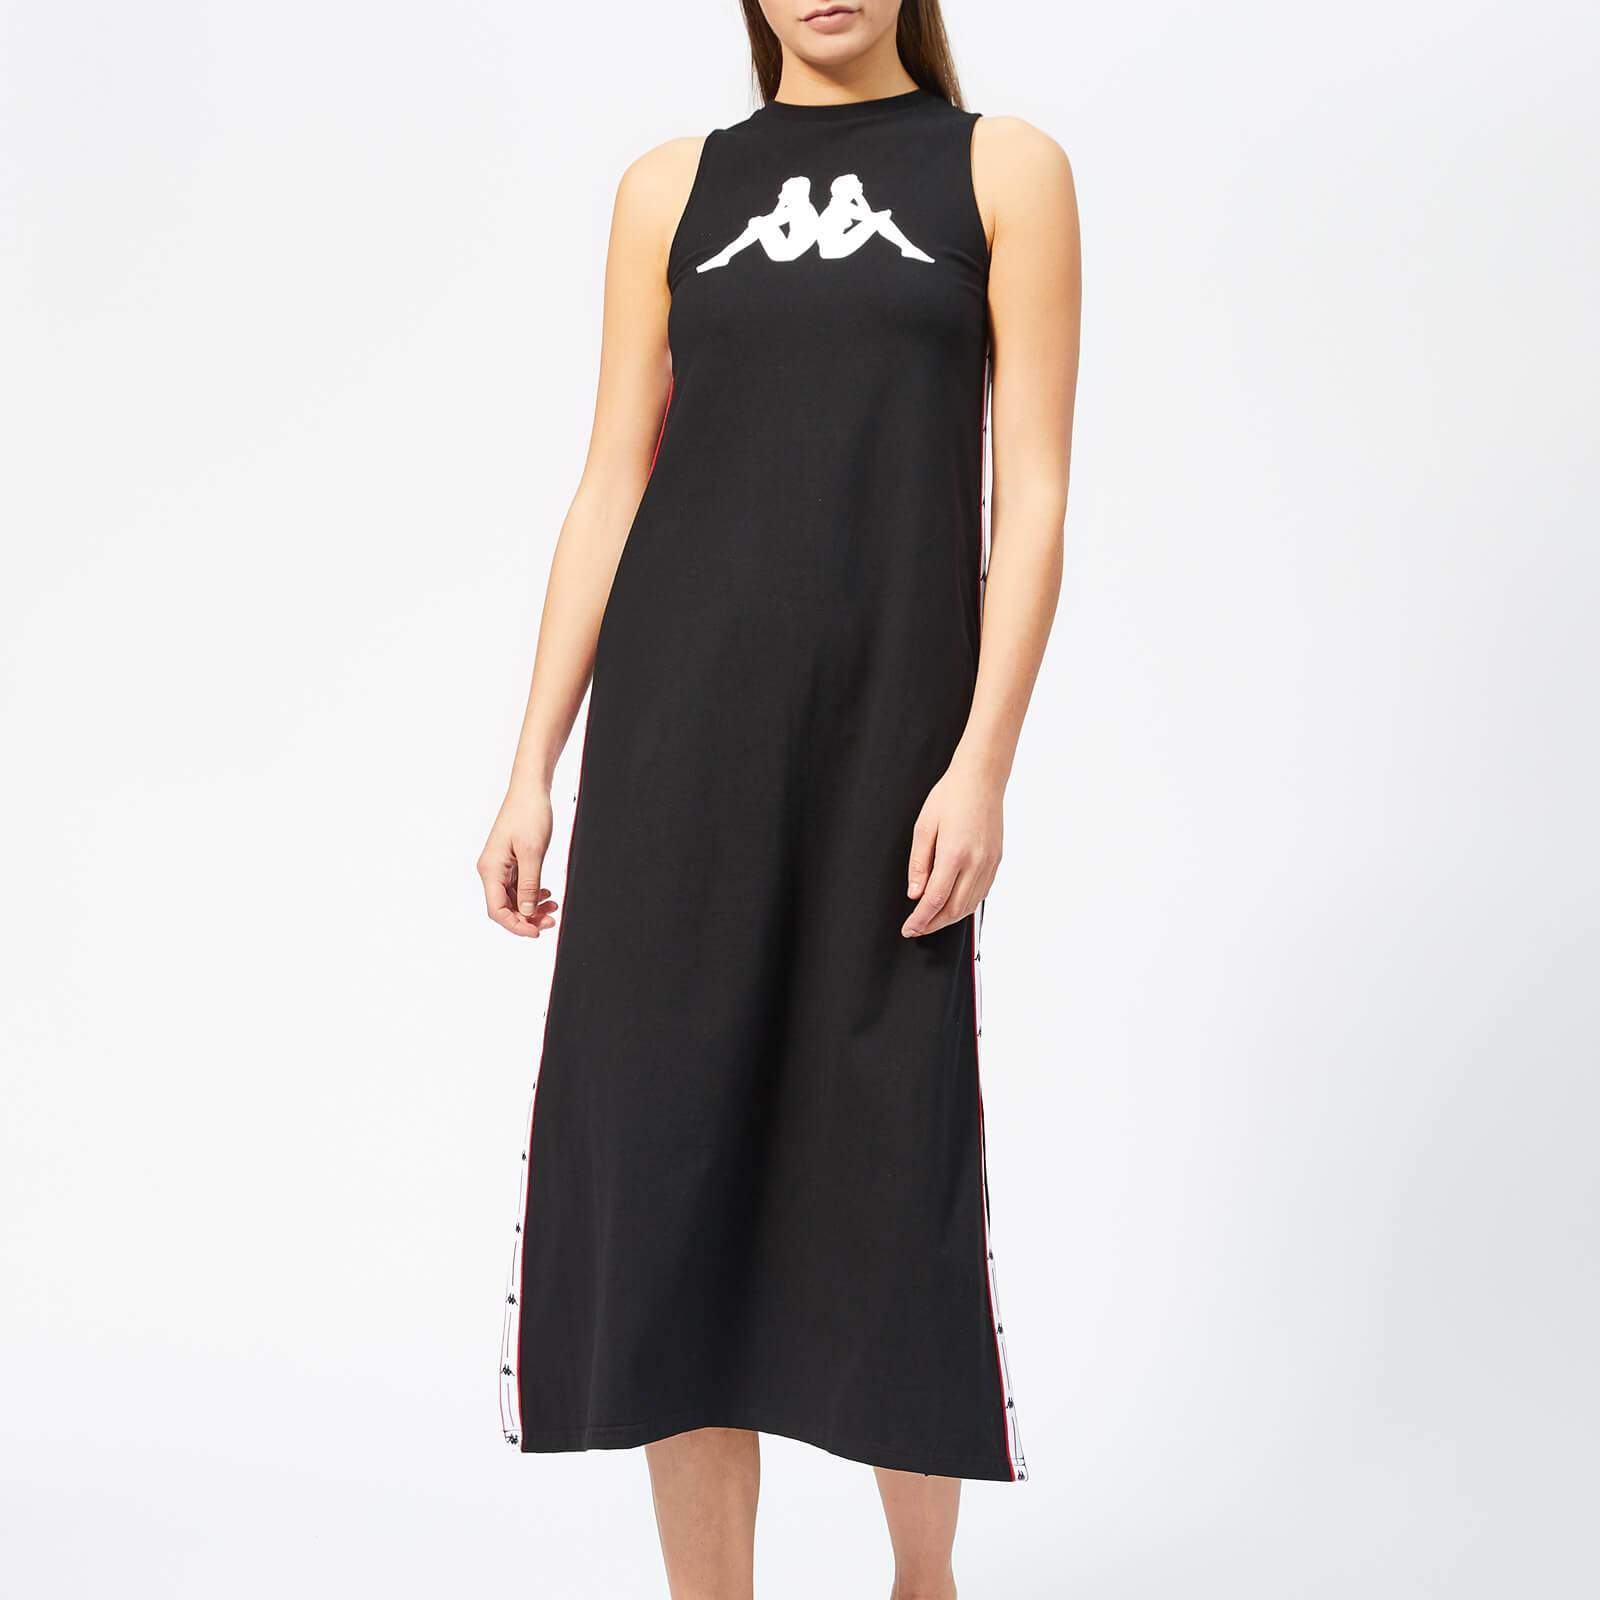 Kappa Women's Authentic Japan Banoy Dress - Black - L - Black